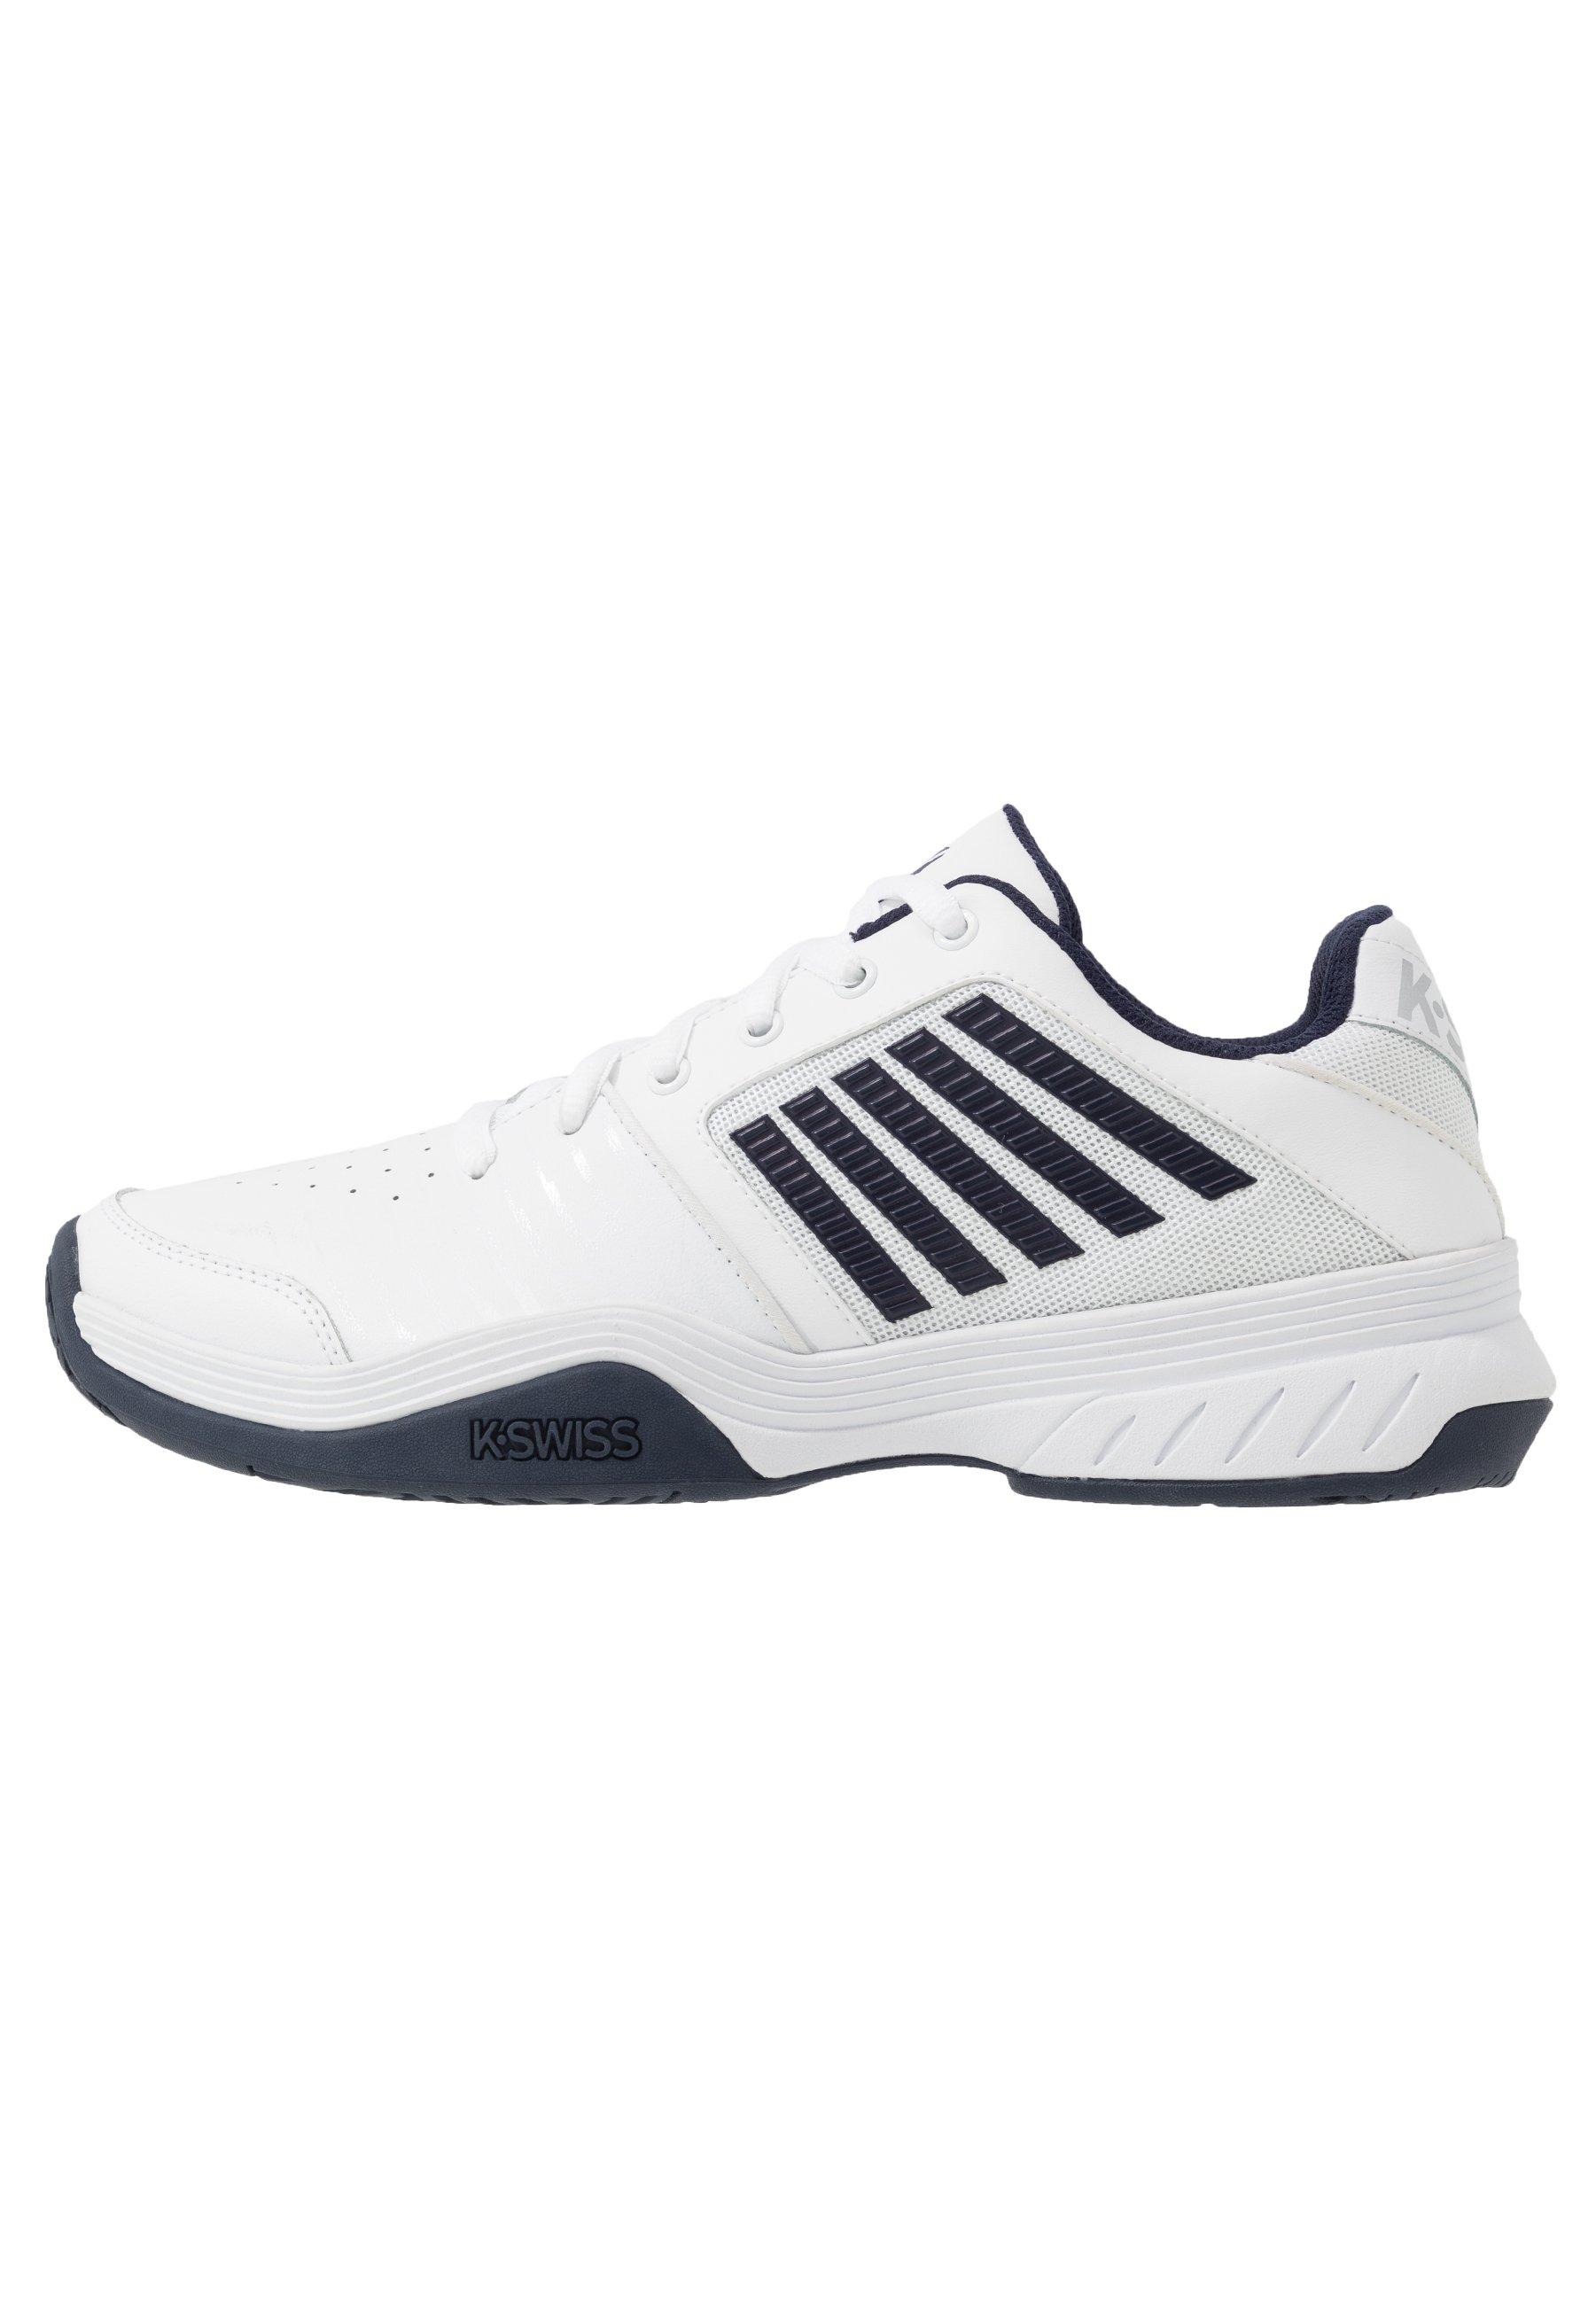 Men COURT EXPRESS - Clay court tennis shoes